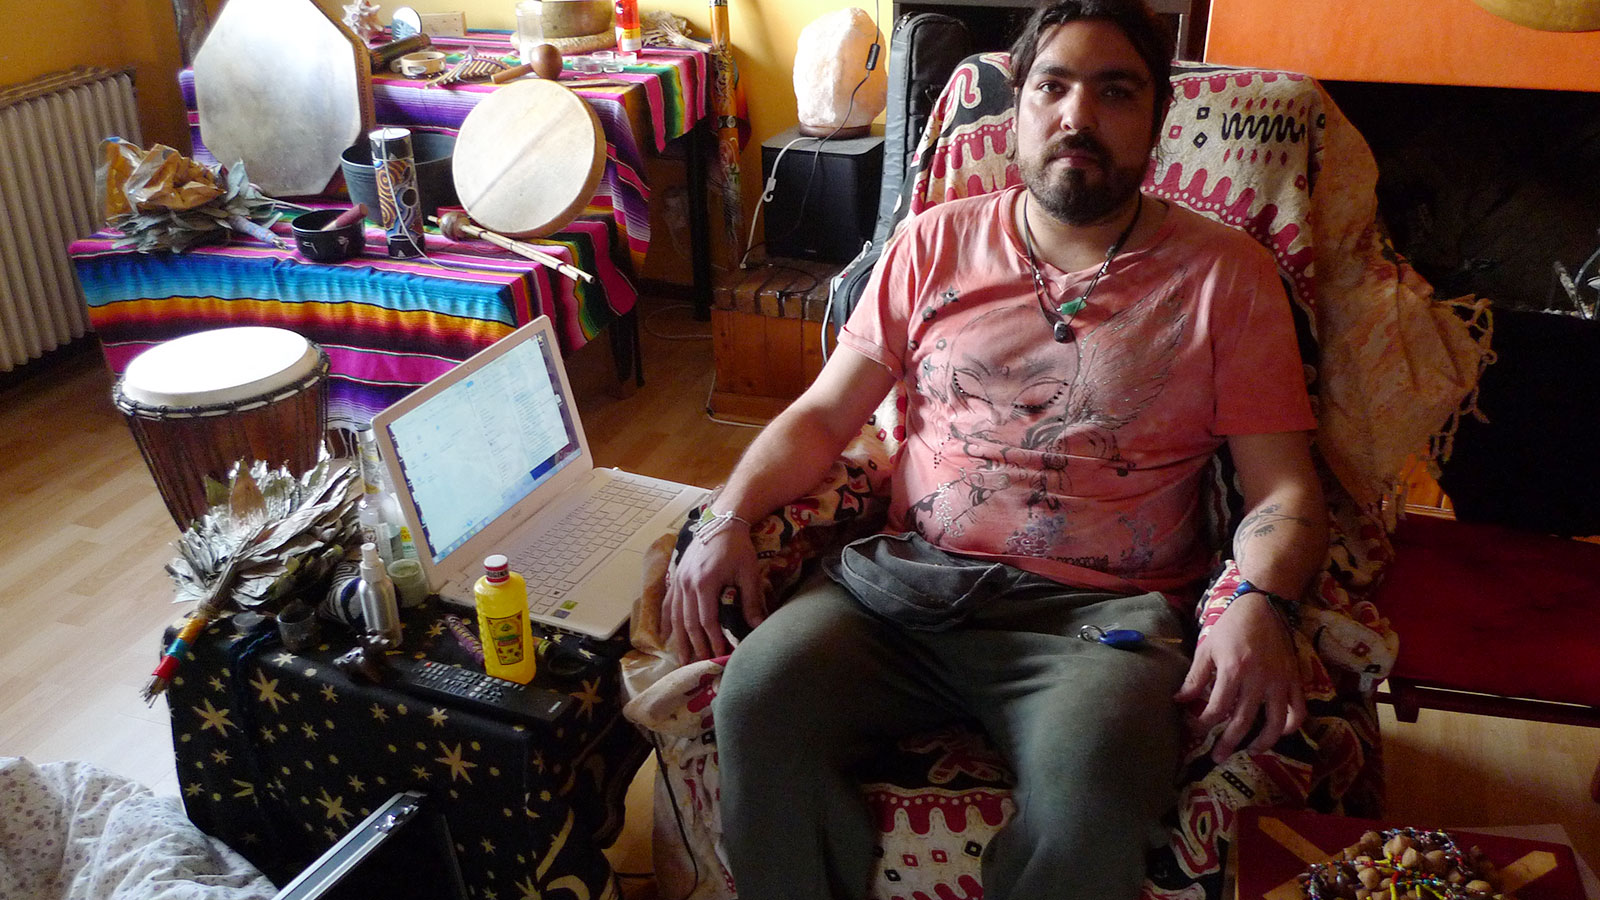 Ayahuasca retreats: Do hallucinations, vomiting improve life